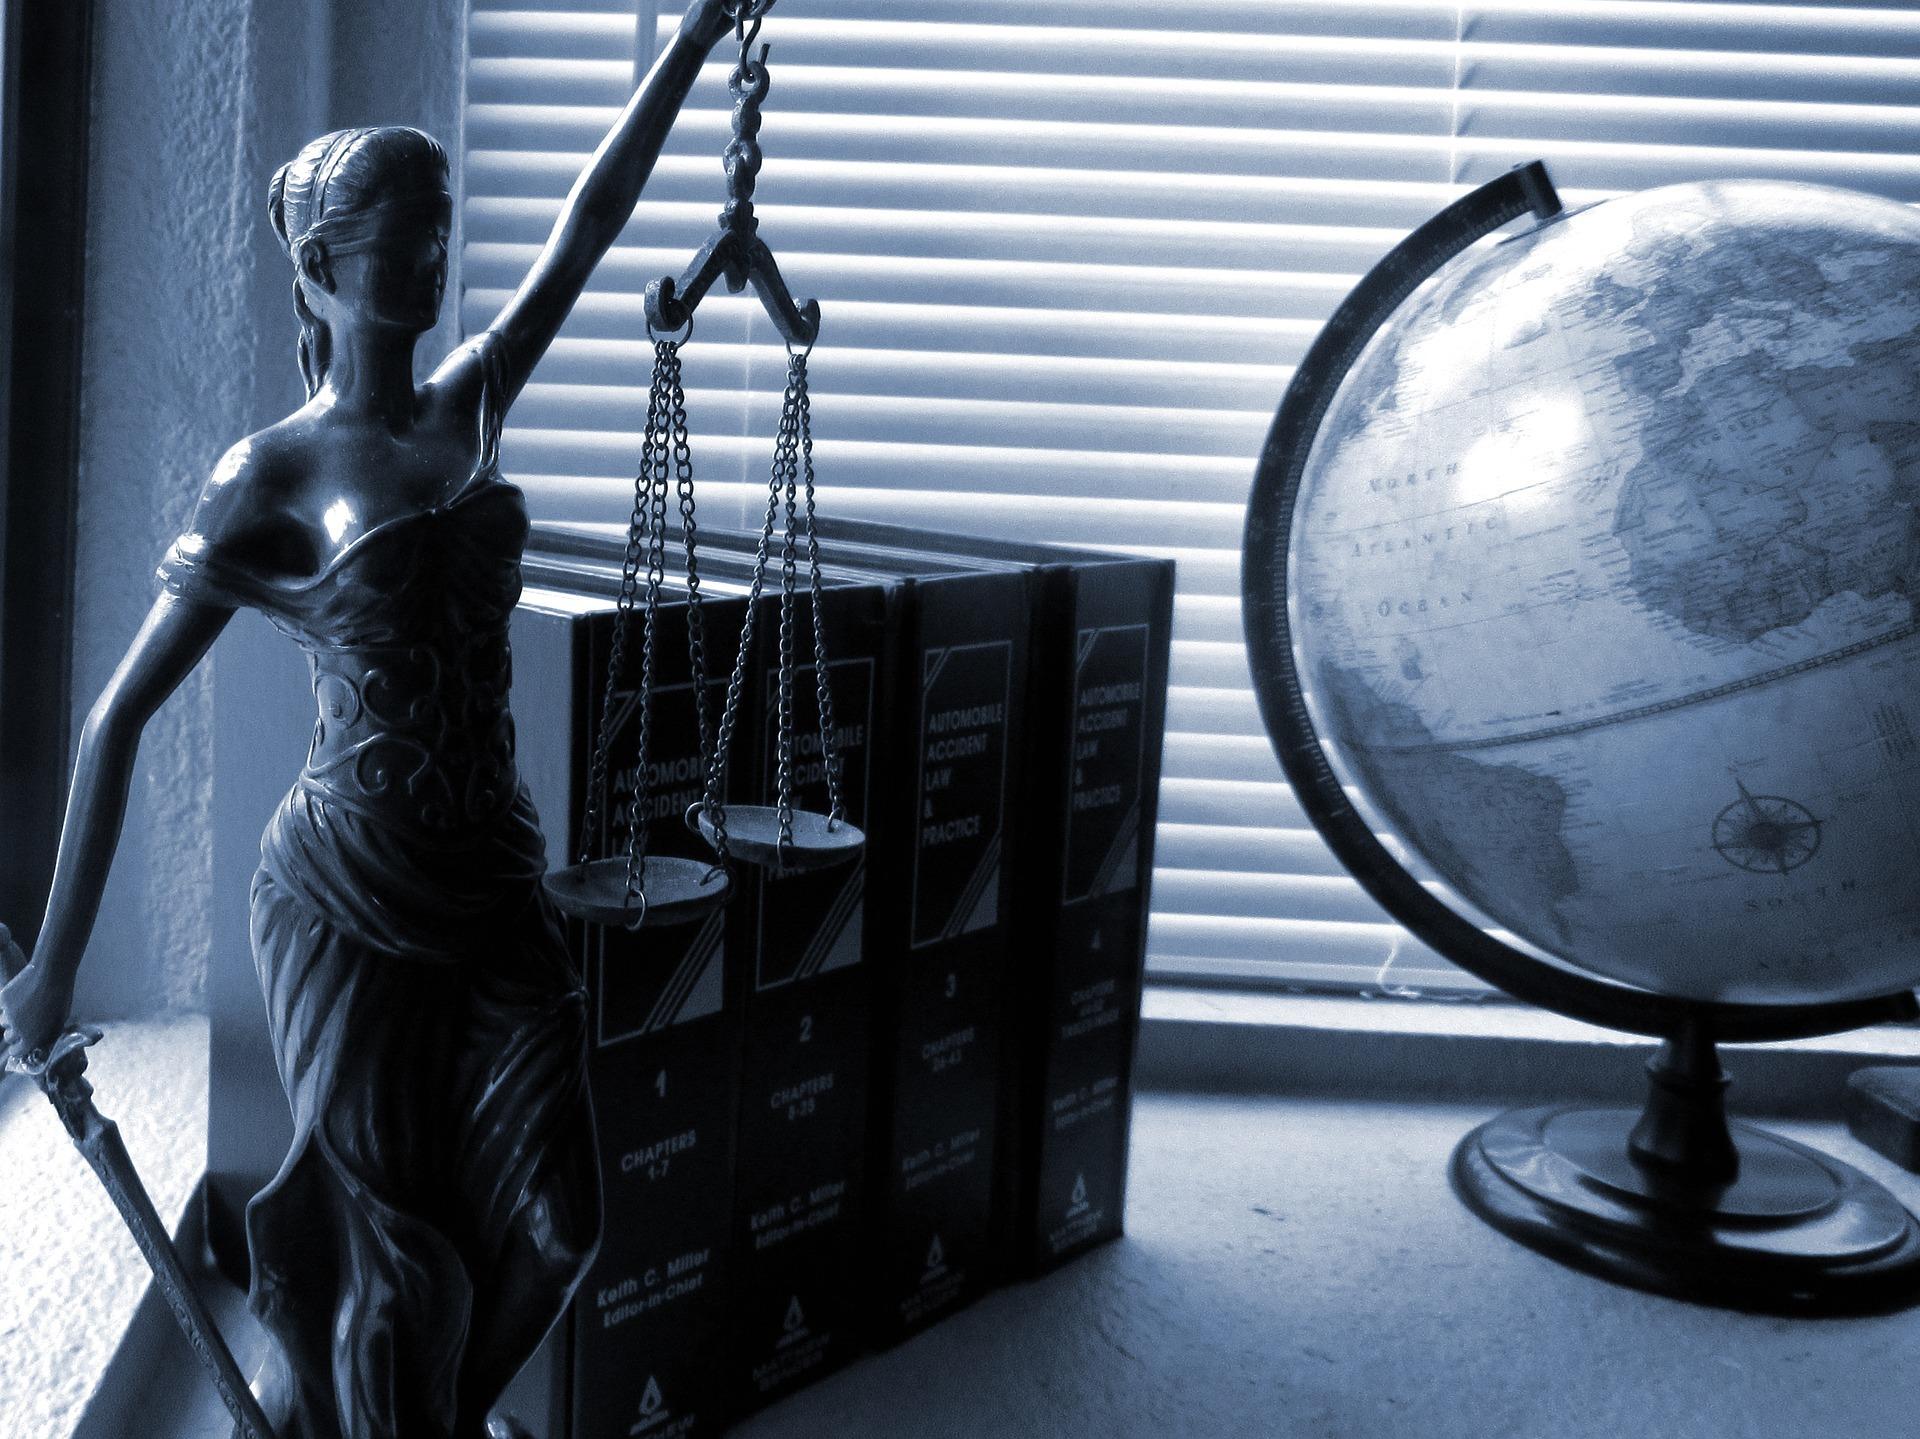 Legal system tropes